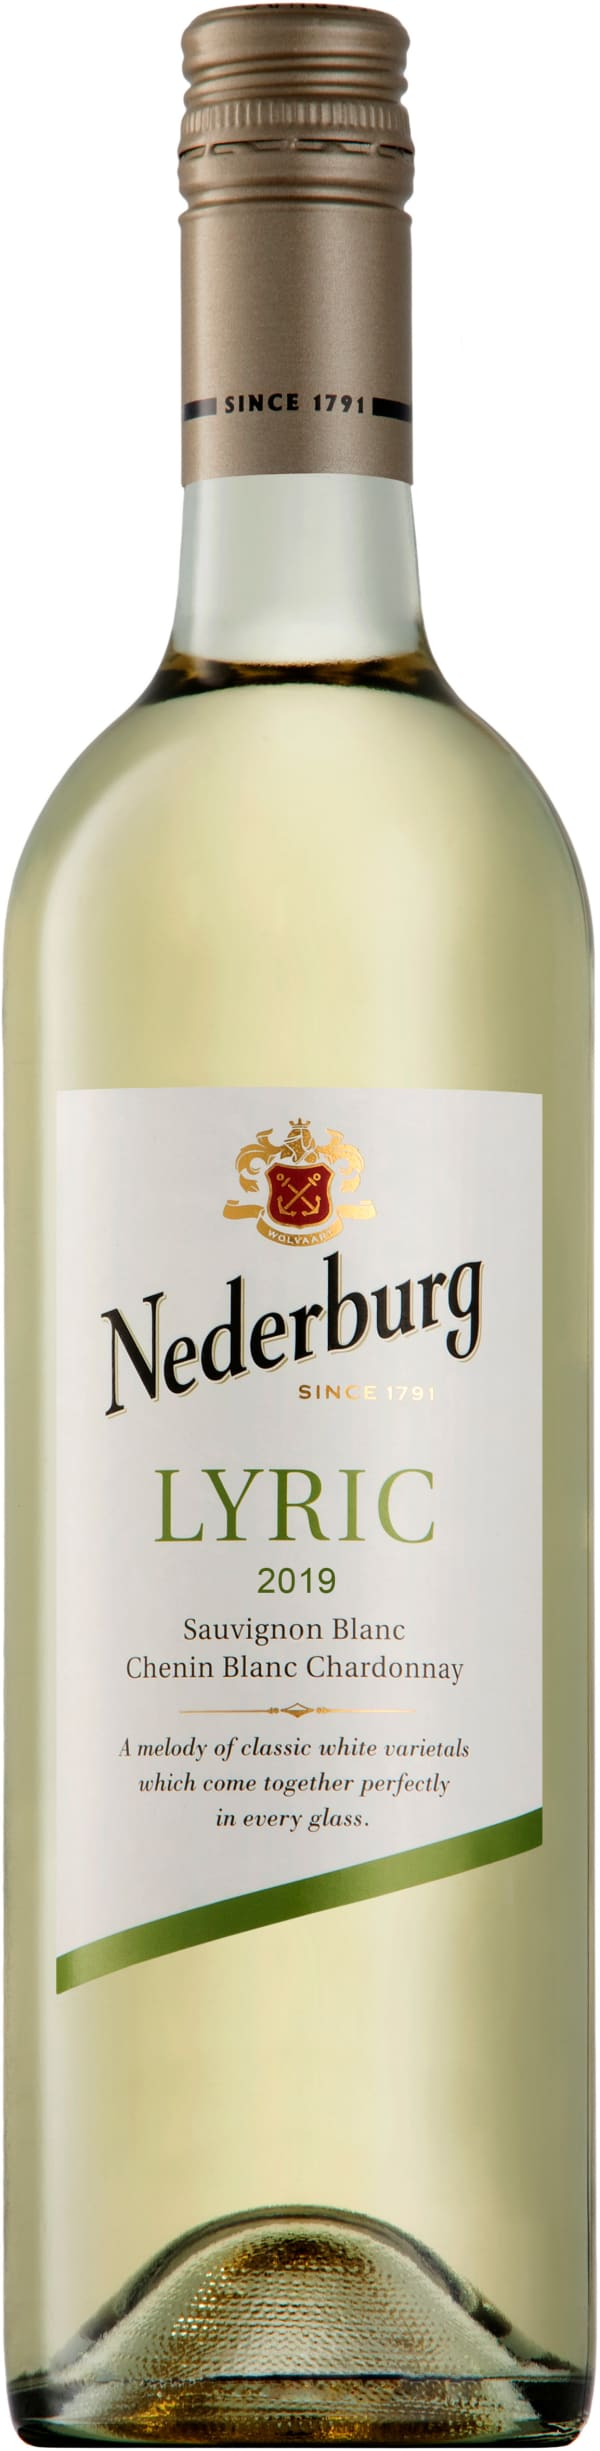 Nederburg Lyric Sauvignon Blanc Chenin Blanc Chardonnay 2019